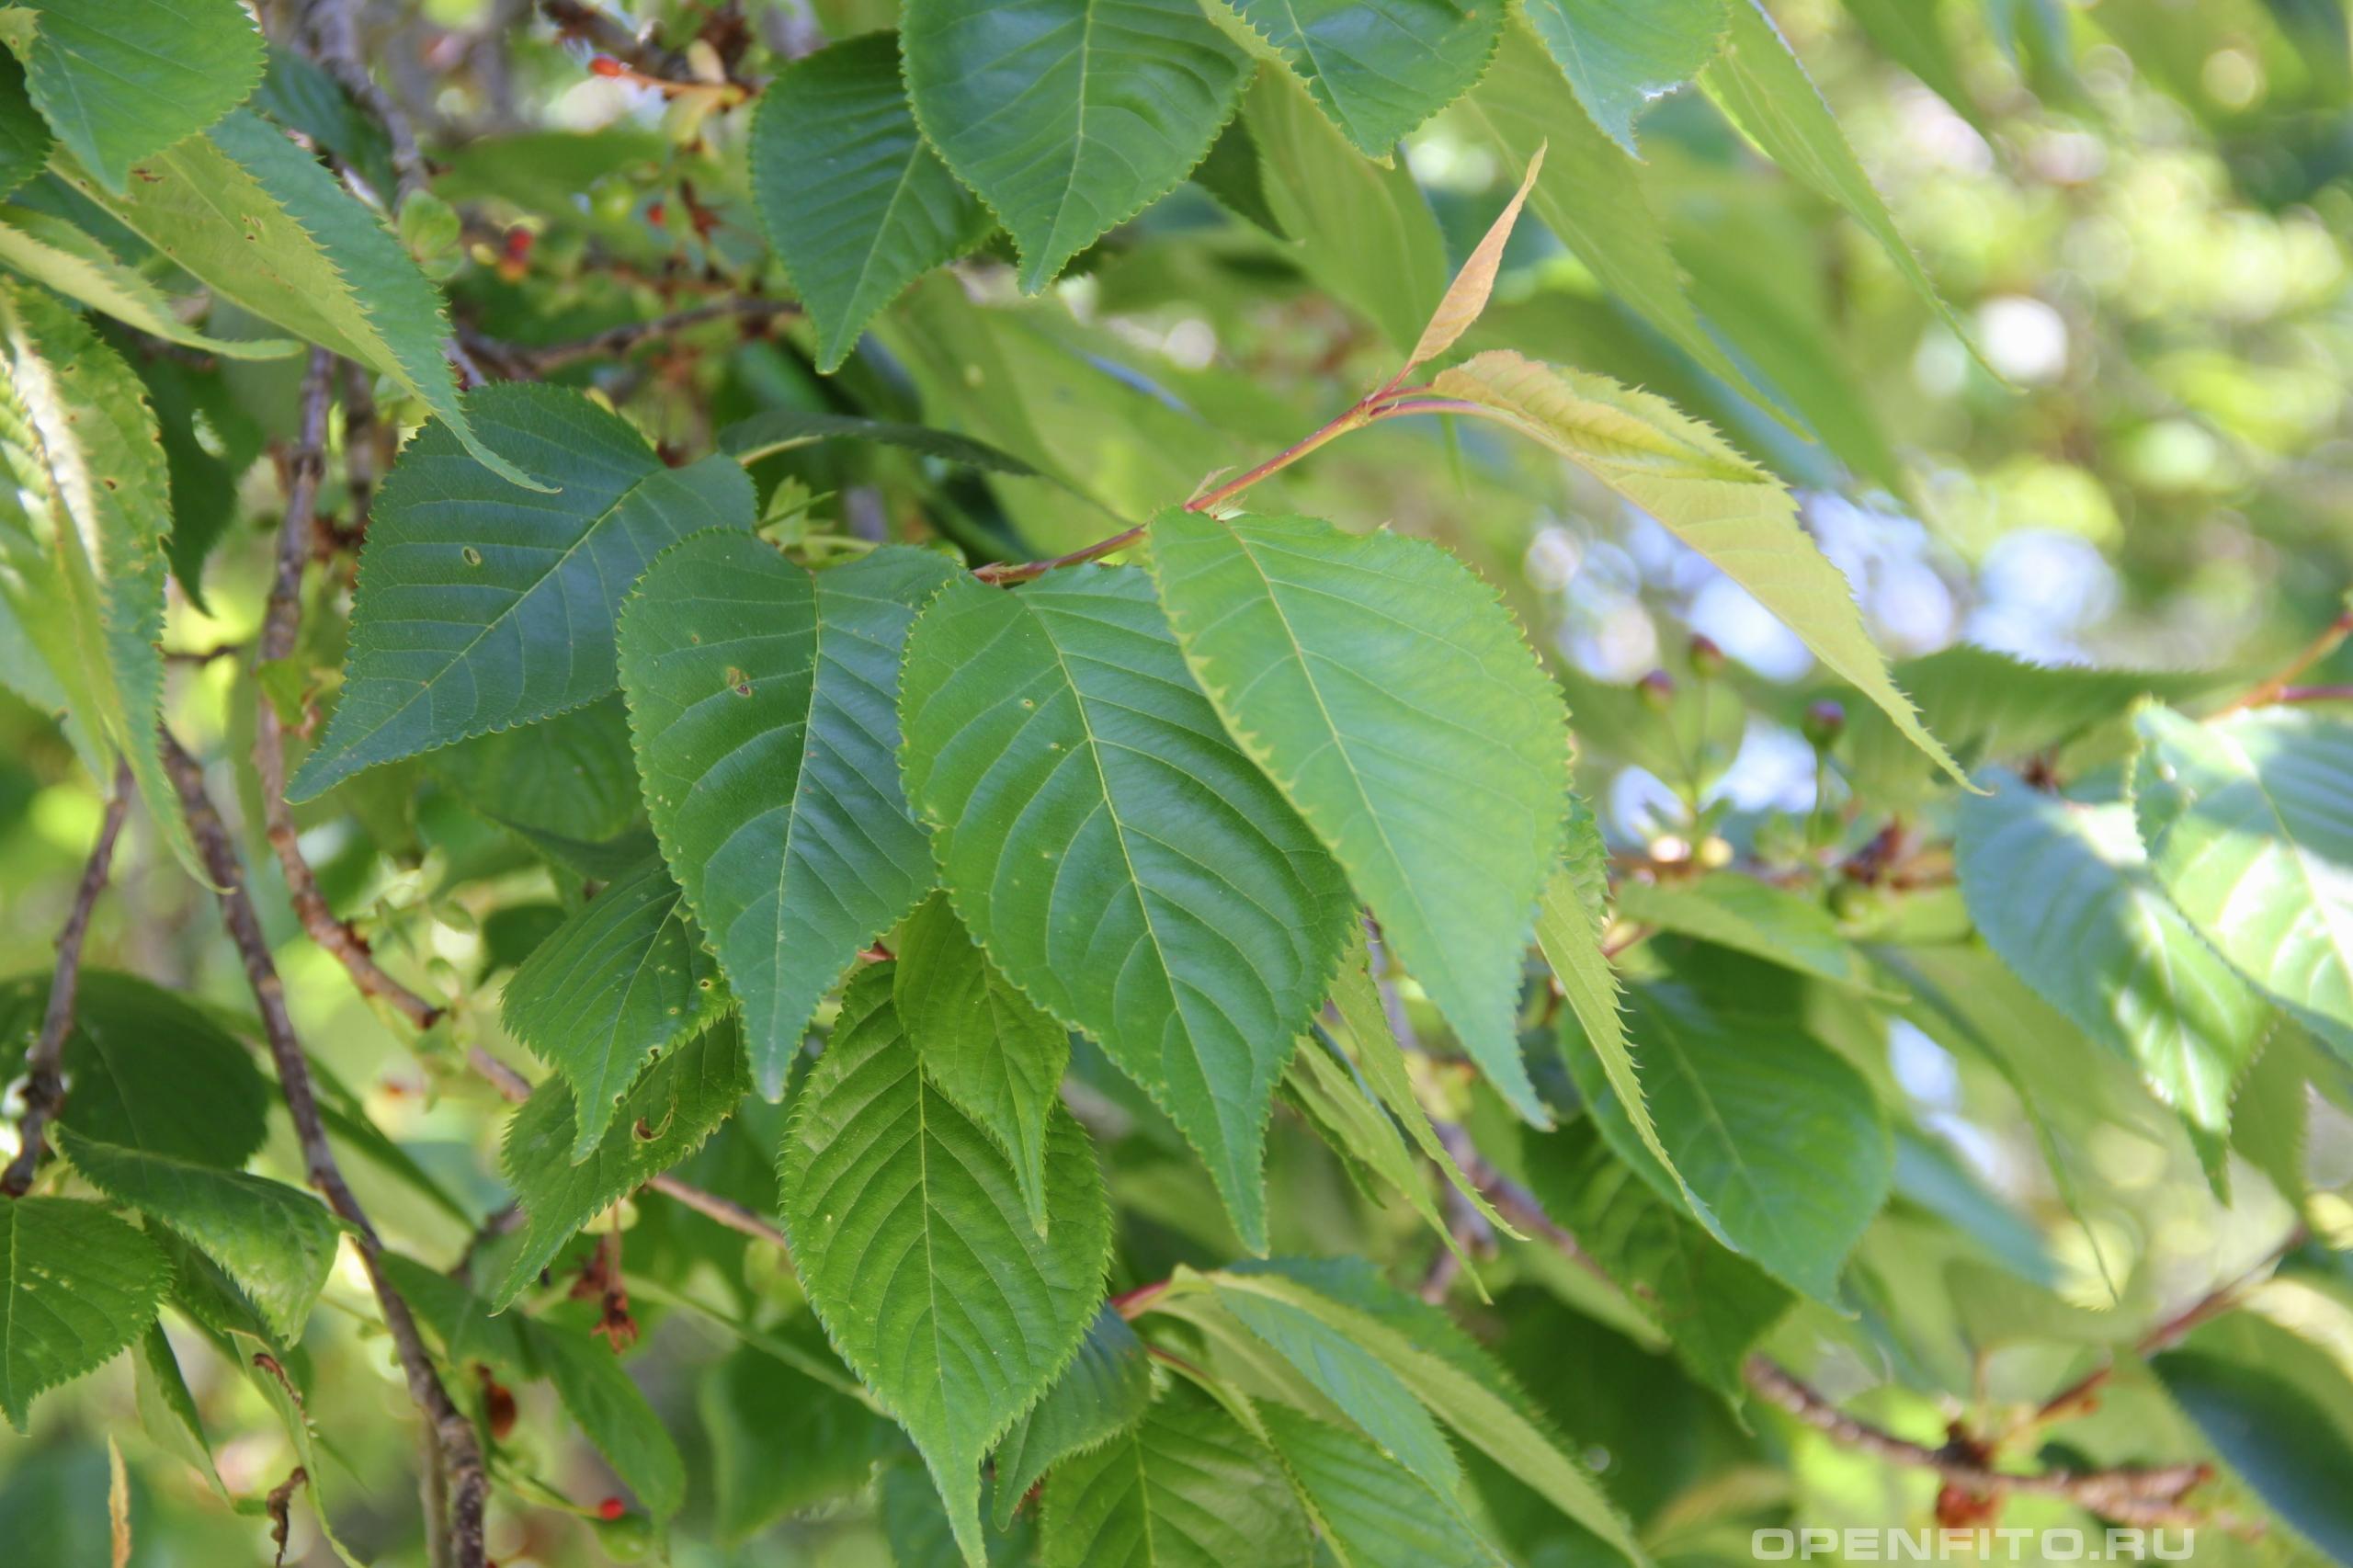 Вишня мелкопильчатая лист